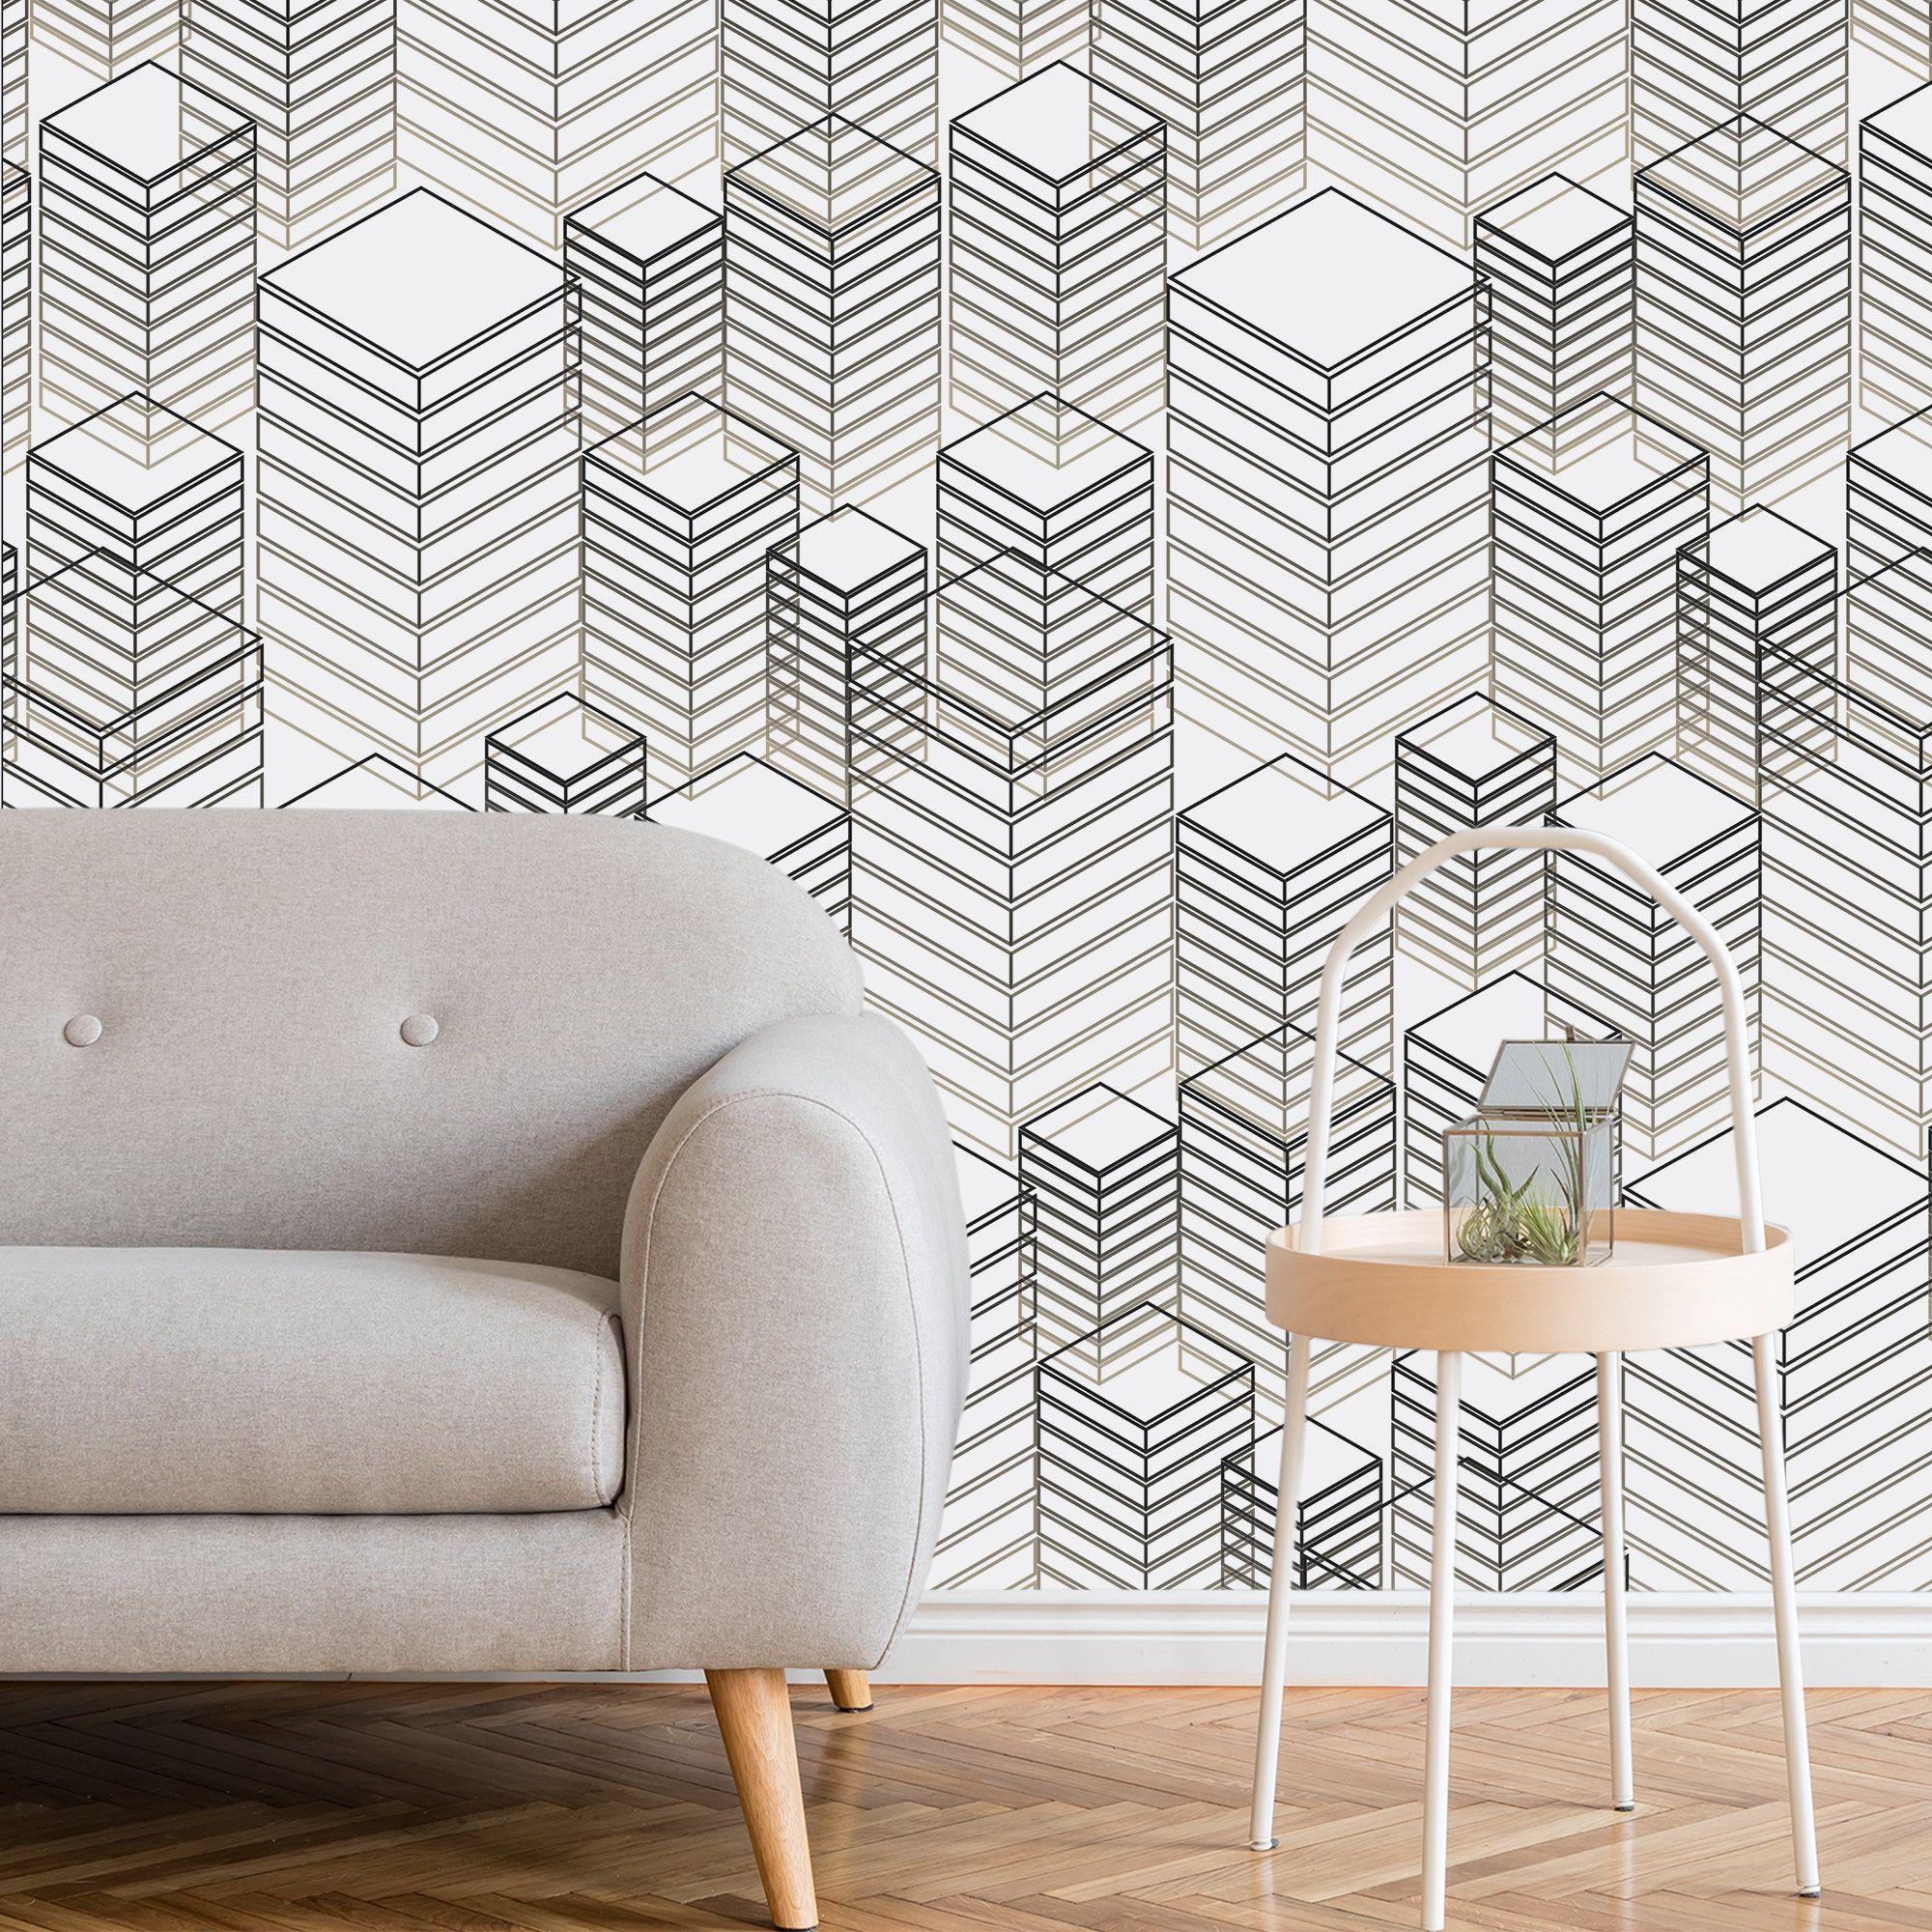 Removable Wallpaper Peel And Stick Wallpaper Wall Decor Etsy Wallpaper Walls Decor Removable Wallpaper Geometric Wall Decor